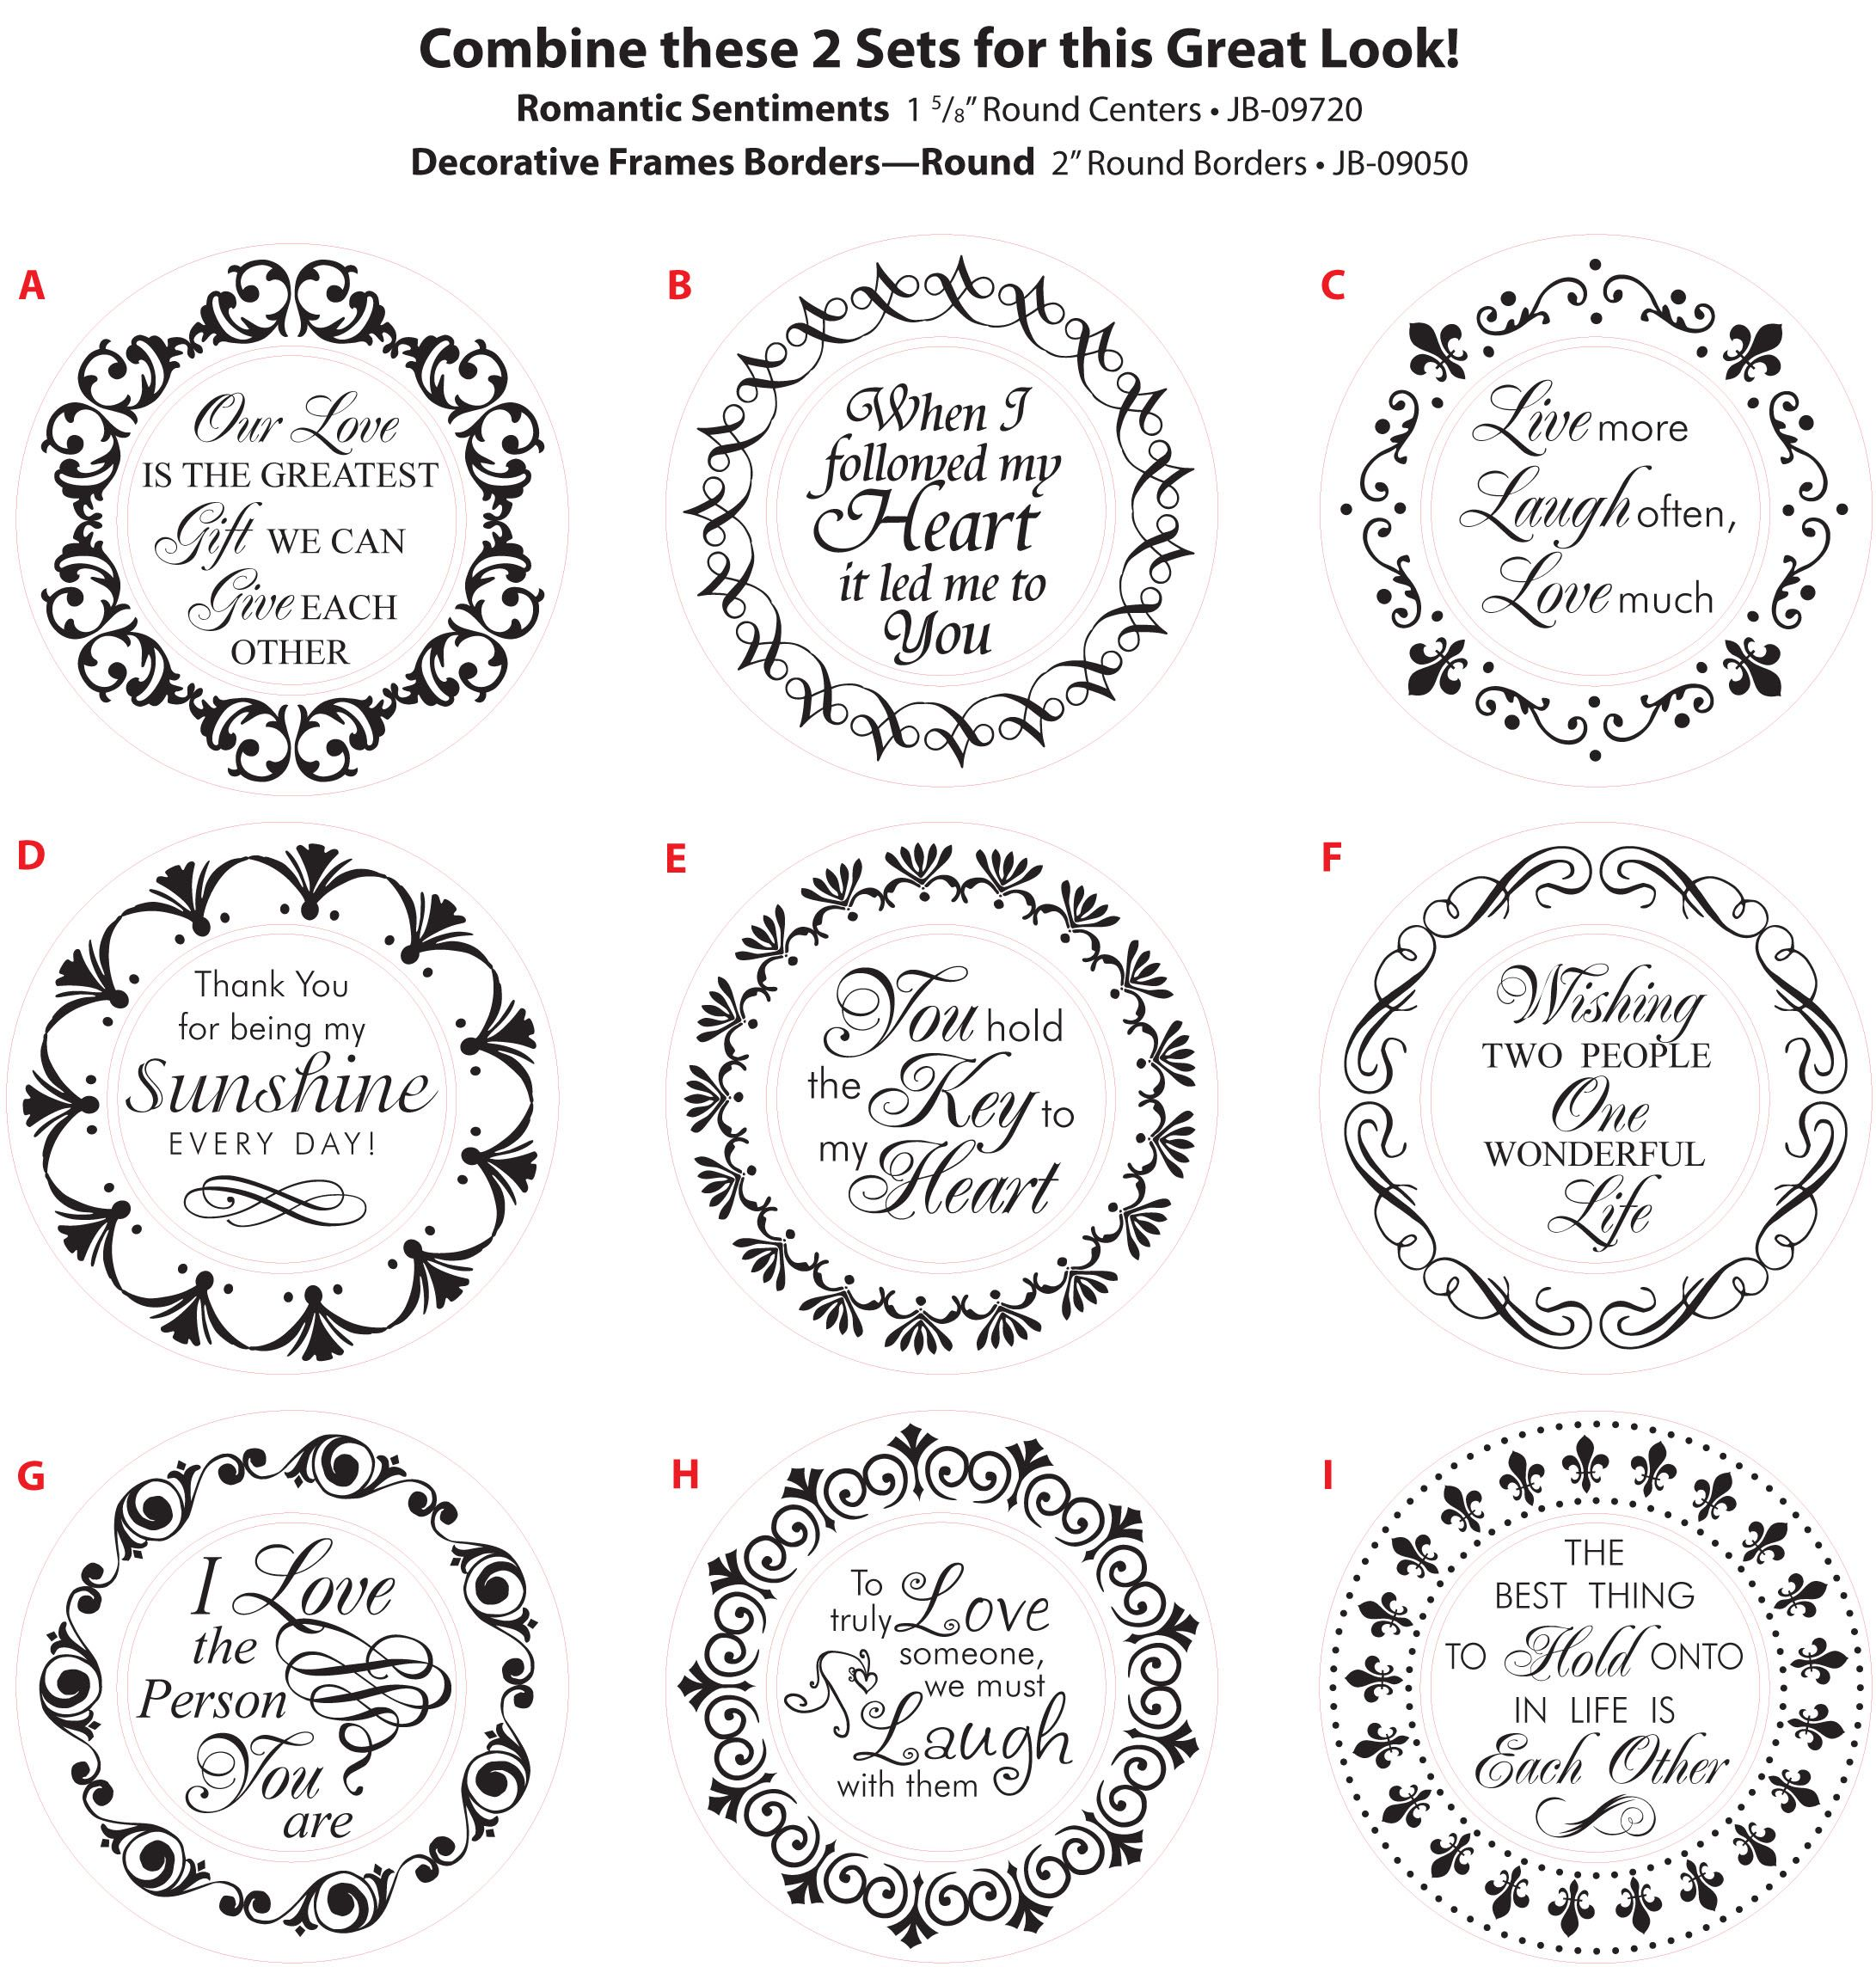 17 Best Images About Card Sentiments On Pinterest: Valentines Sentiments